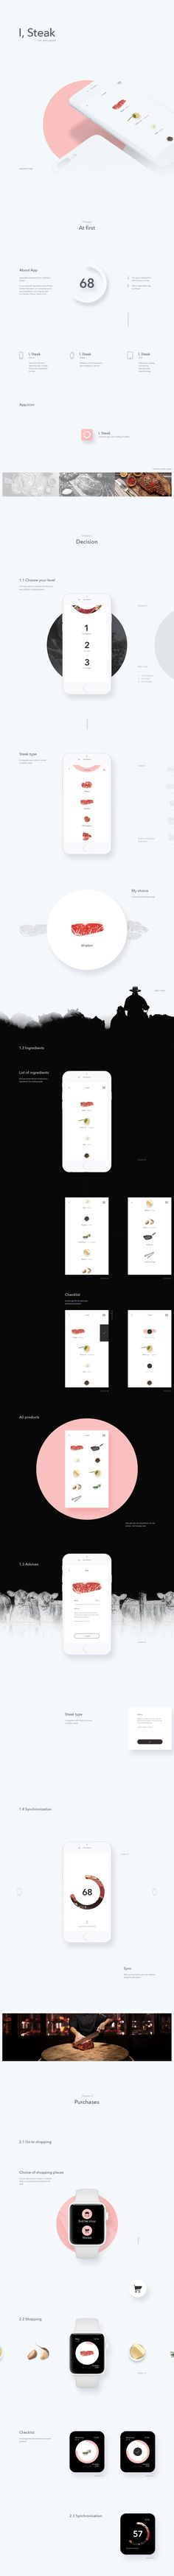 Minimal . Pink . Black&White . App . UI . UX . Products I, Steak App, Сайт © Алексей Юрков